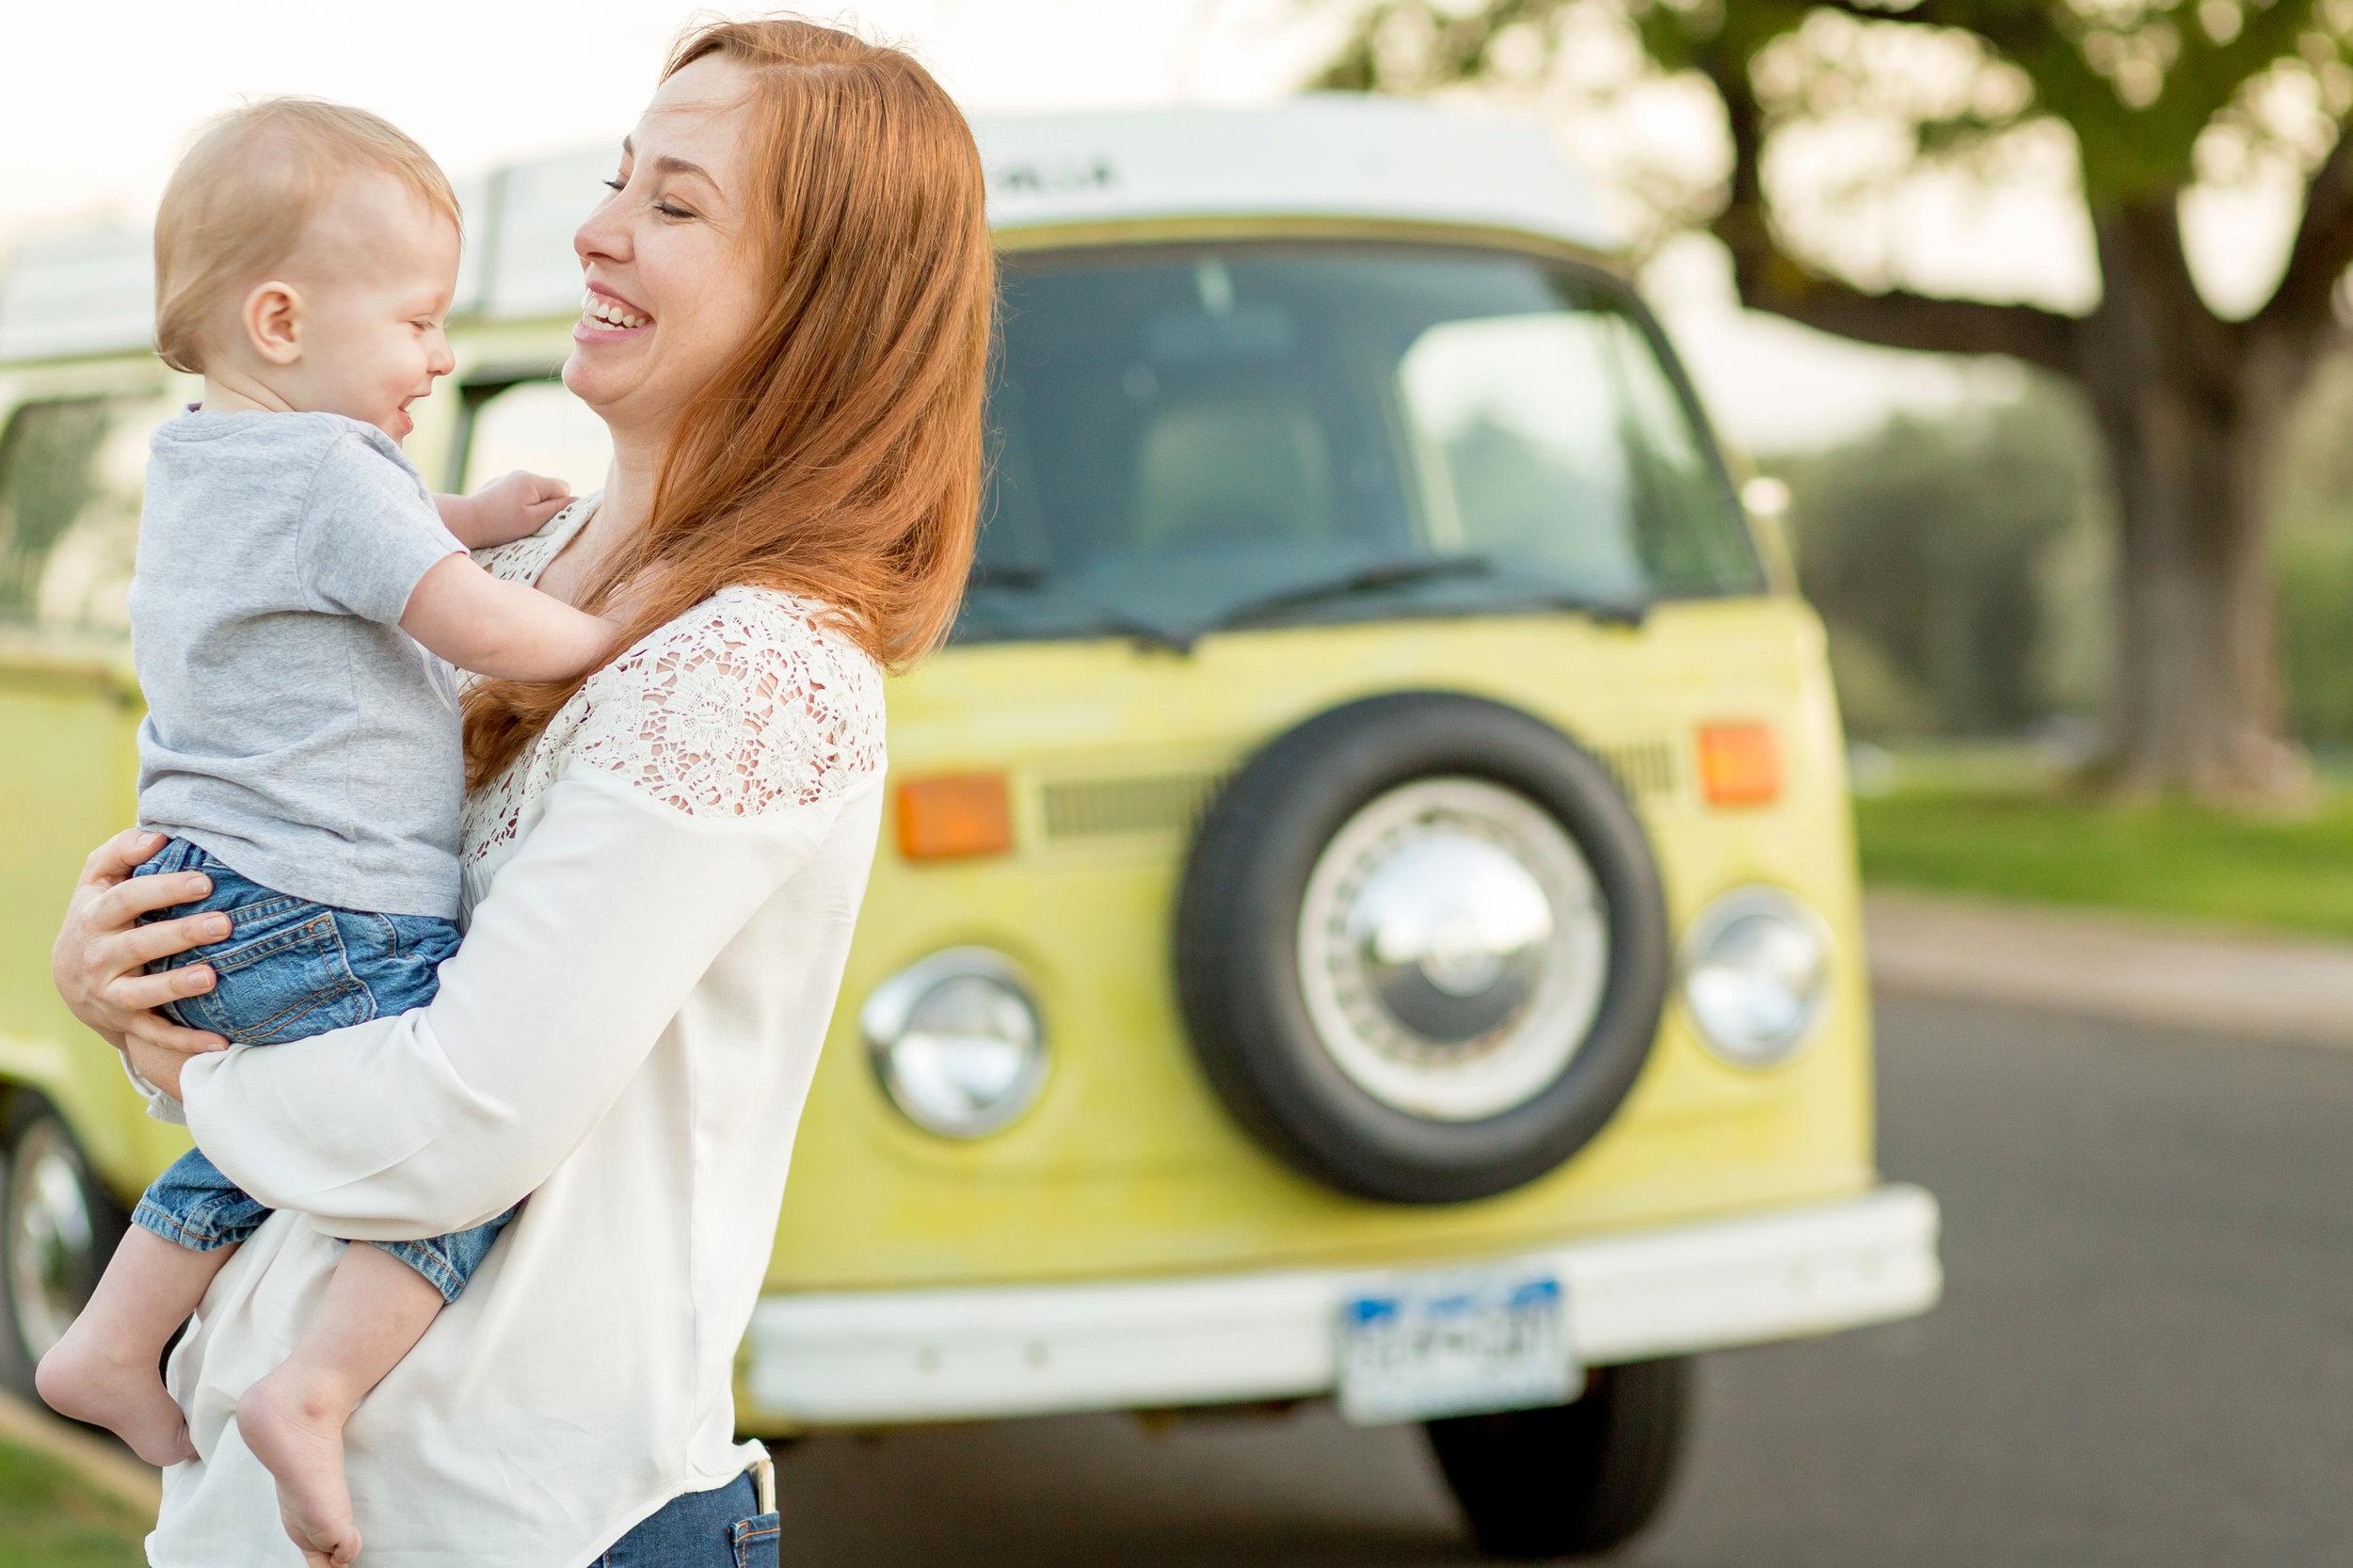 Denver Newborn Photographer, Denver Maternity Photographer, Boulder Maternity Photographer, Boulder Newborn Photographer